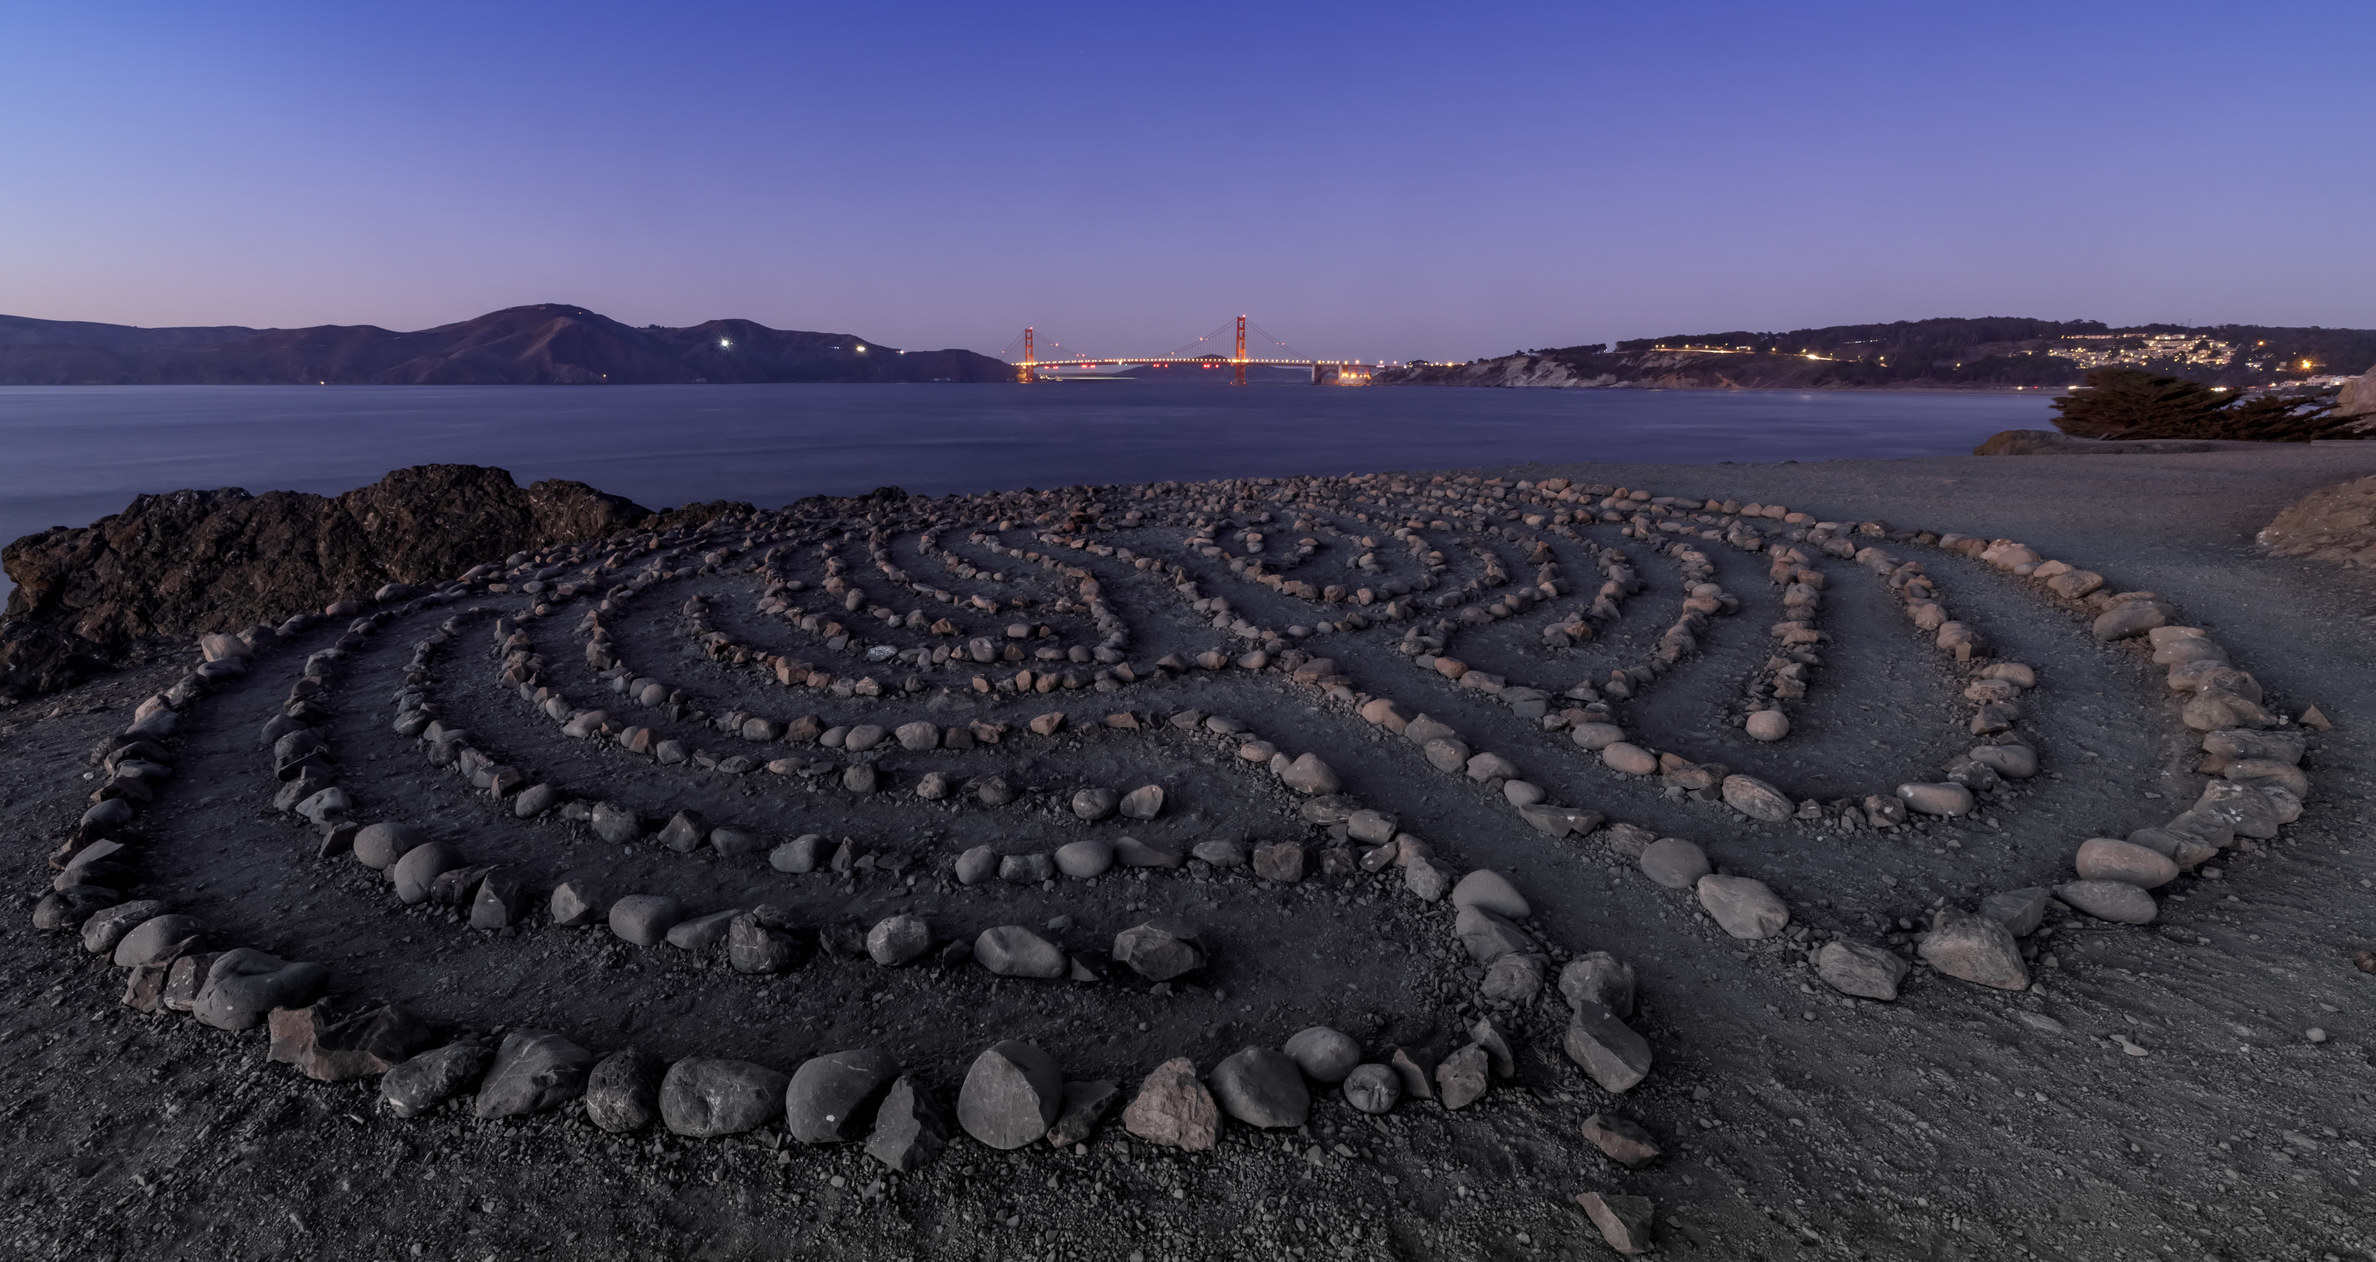 A rock maze overlooking an ocean and city view.